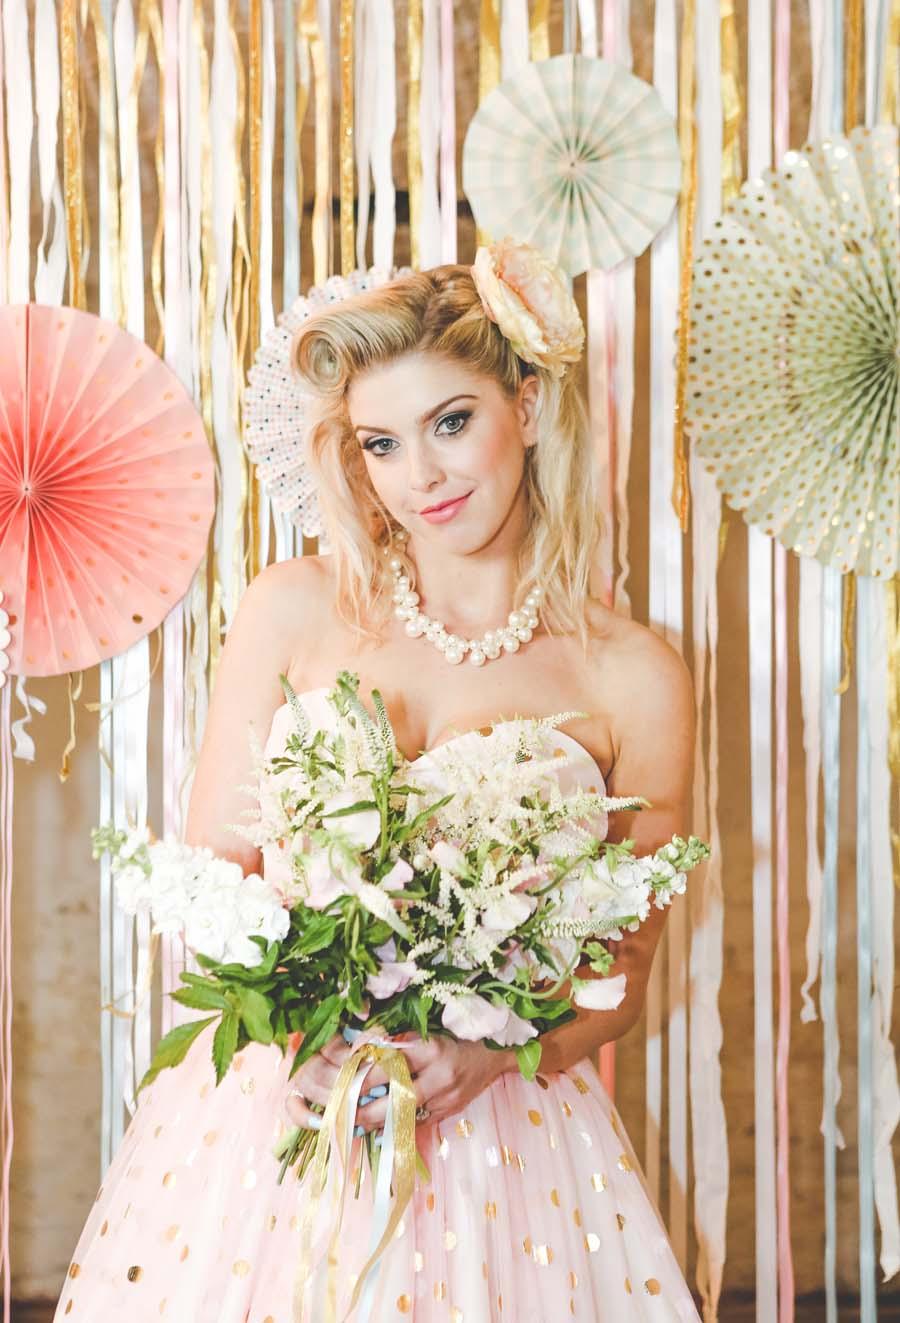 A Vintage Pastel Robot Themed Wedding Shoot Bridalpulse